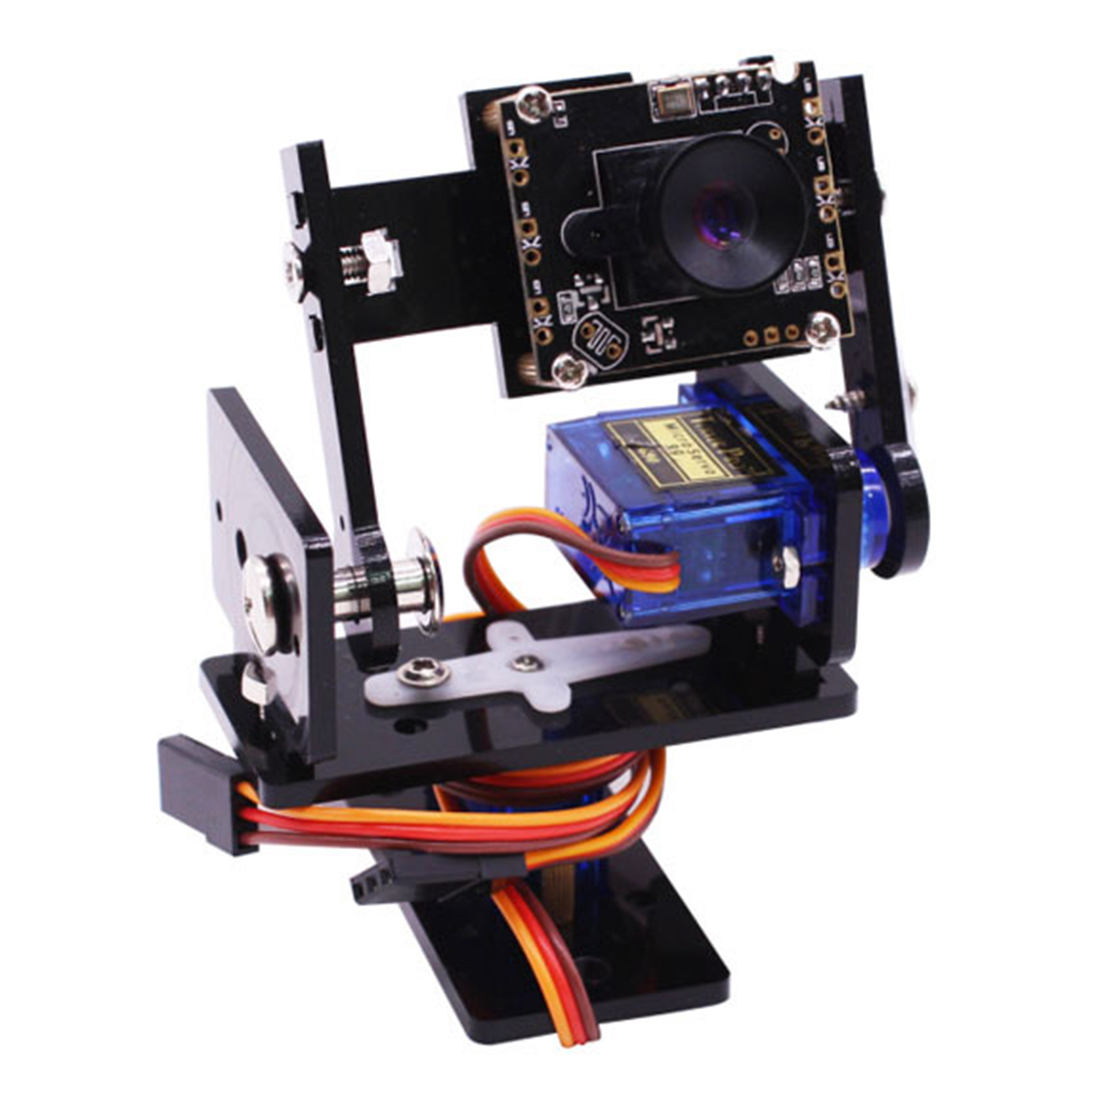 Hot DealsCamera-Module Servos Robot Pan-Tilt-Kit Smart-Vision-Sensor Raspberry Micro with 2pcs